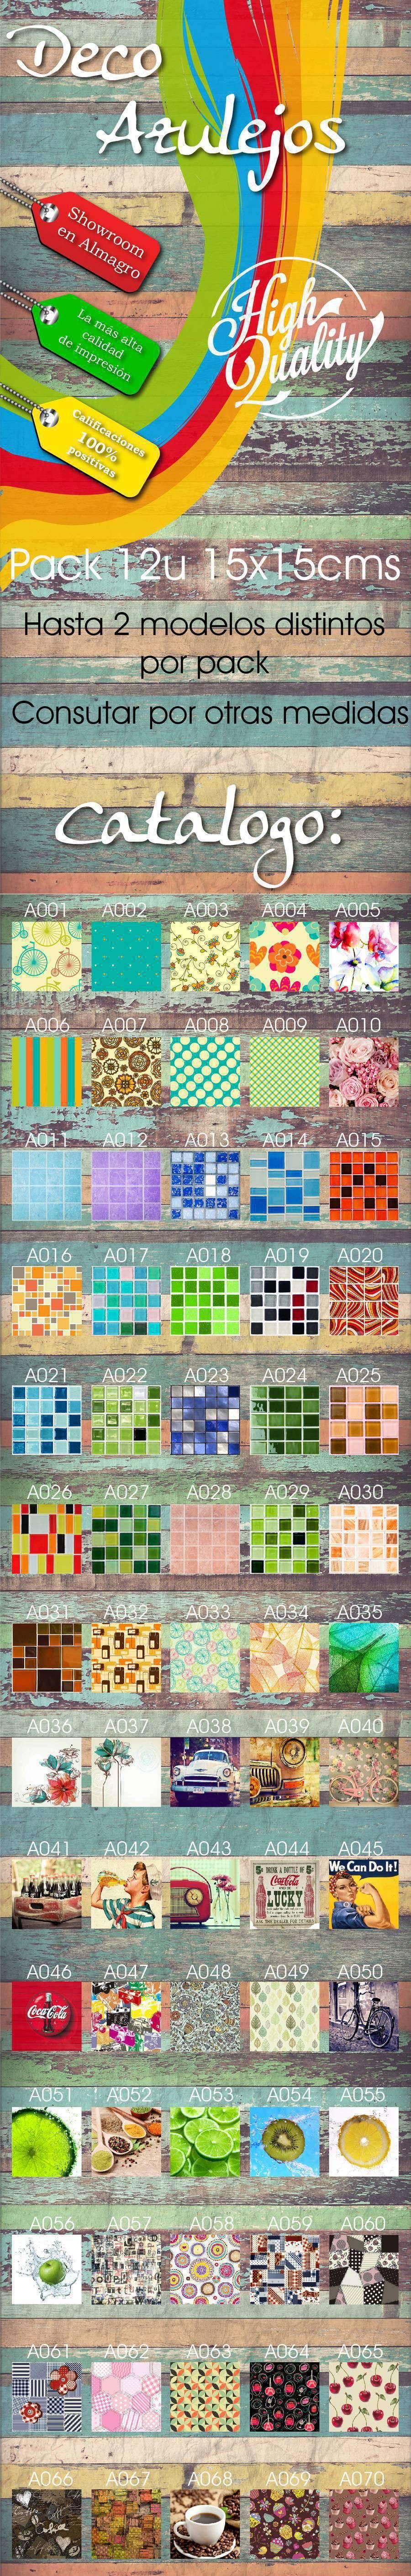 catalogo colores